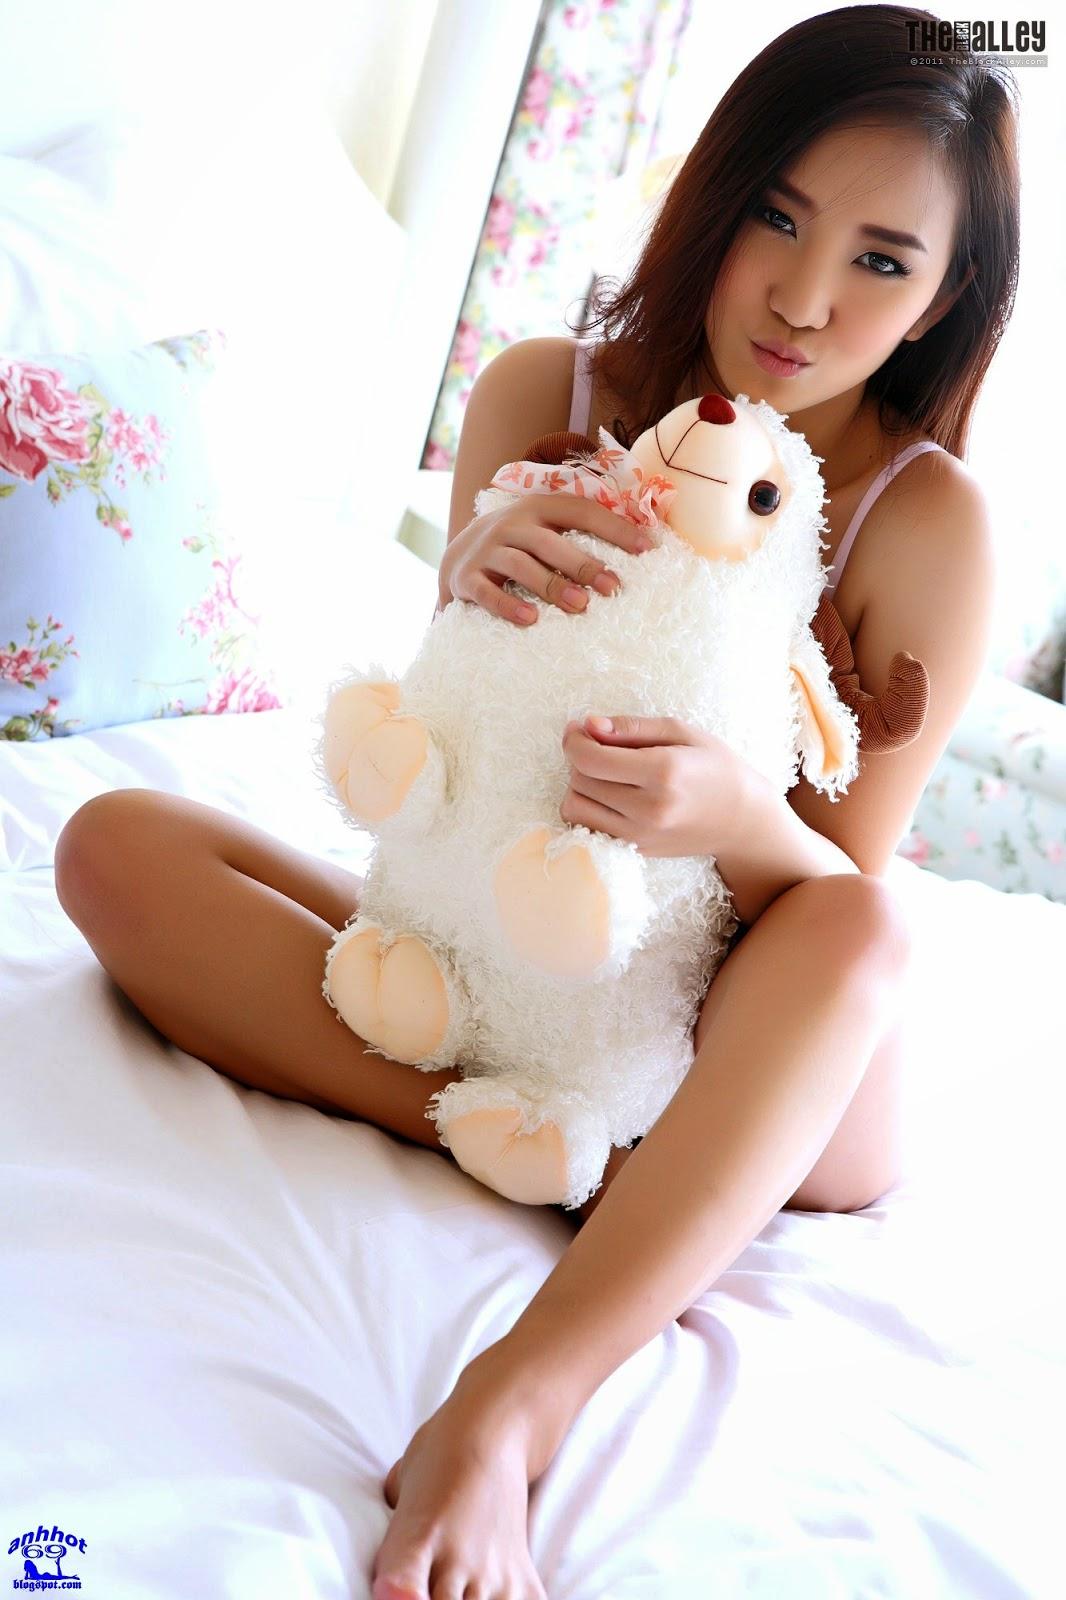 lolita-cheng-64-030